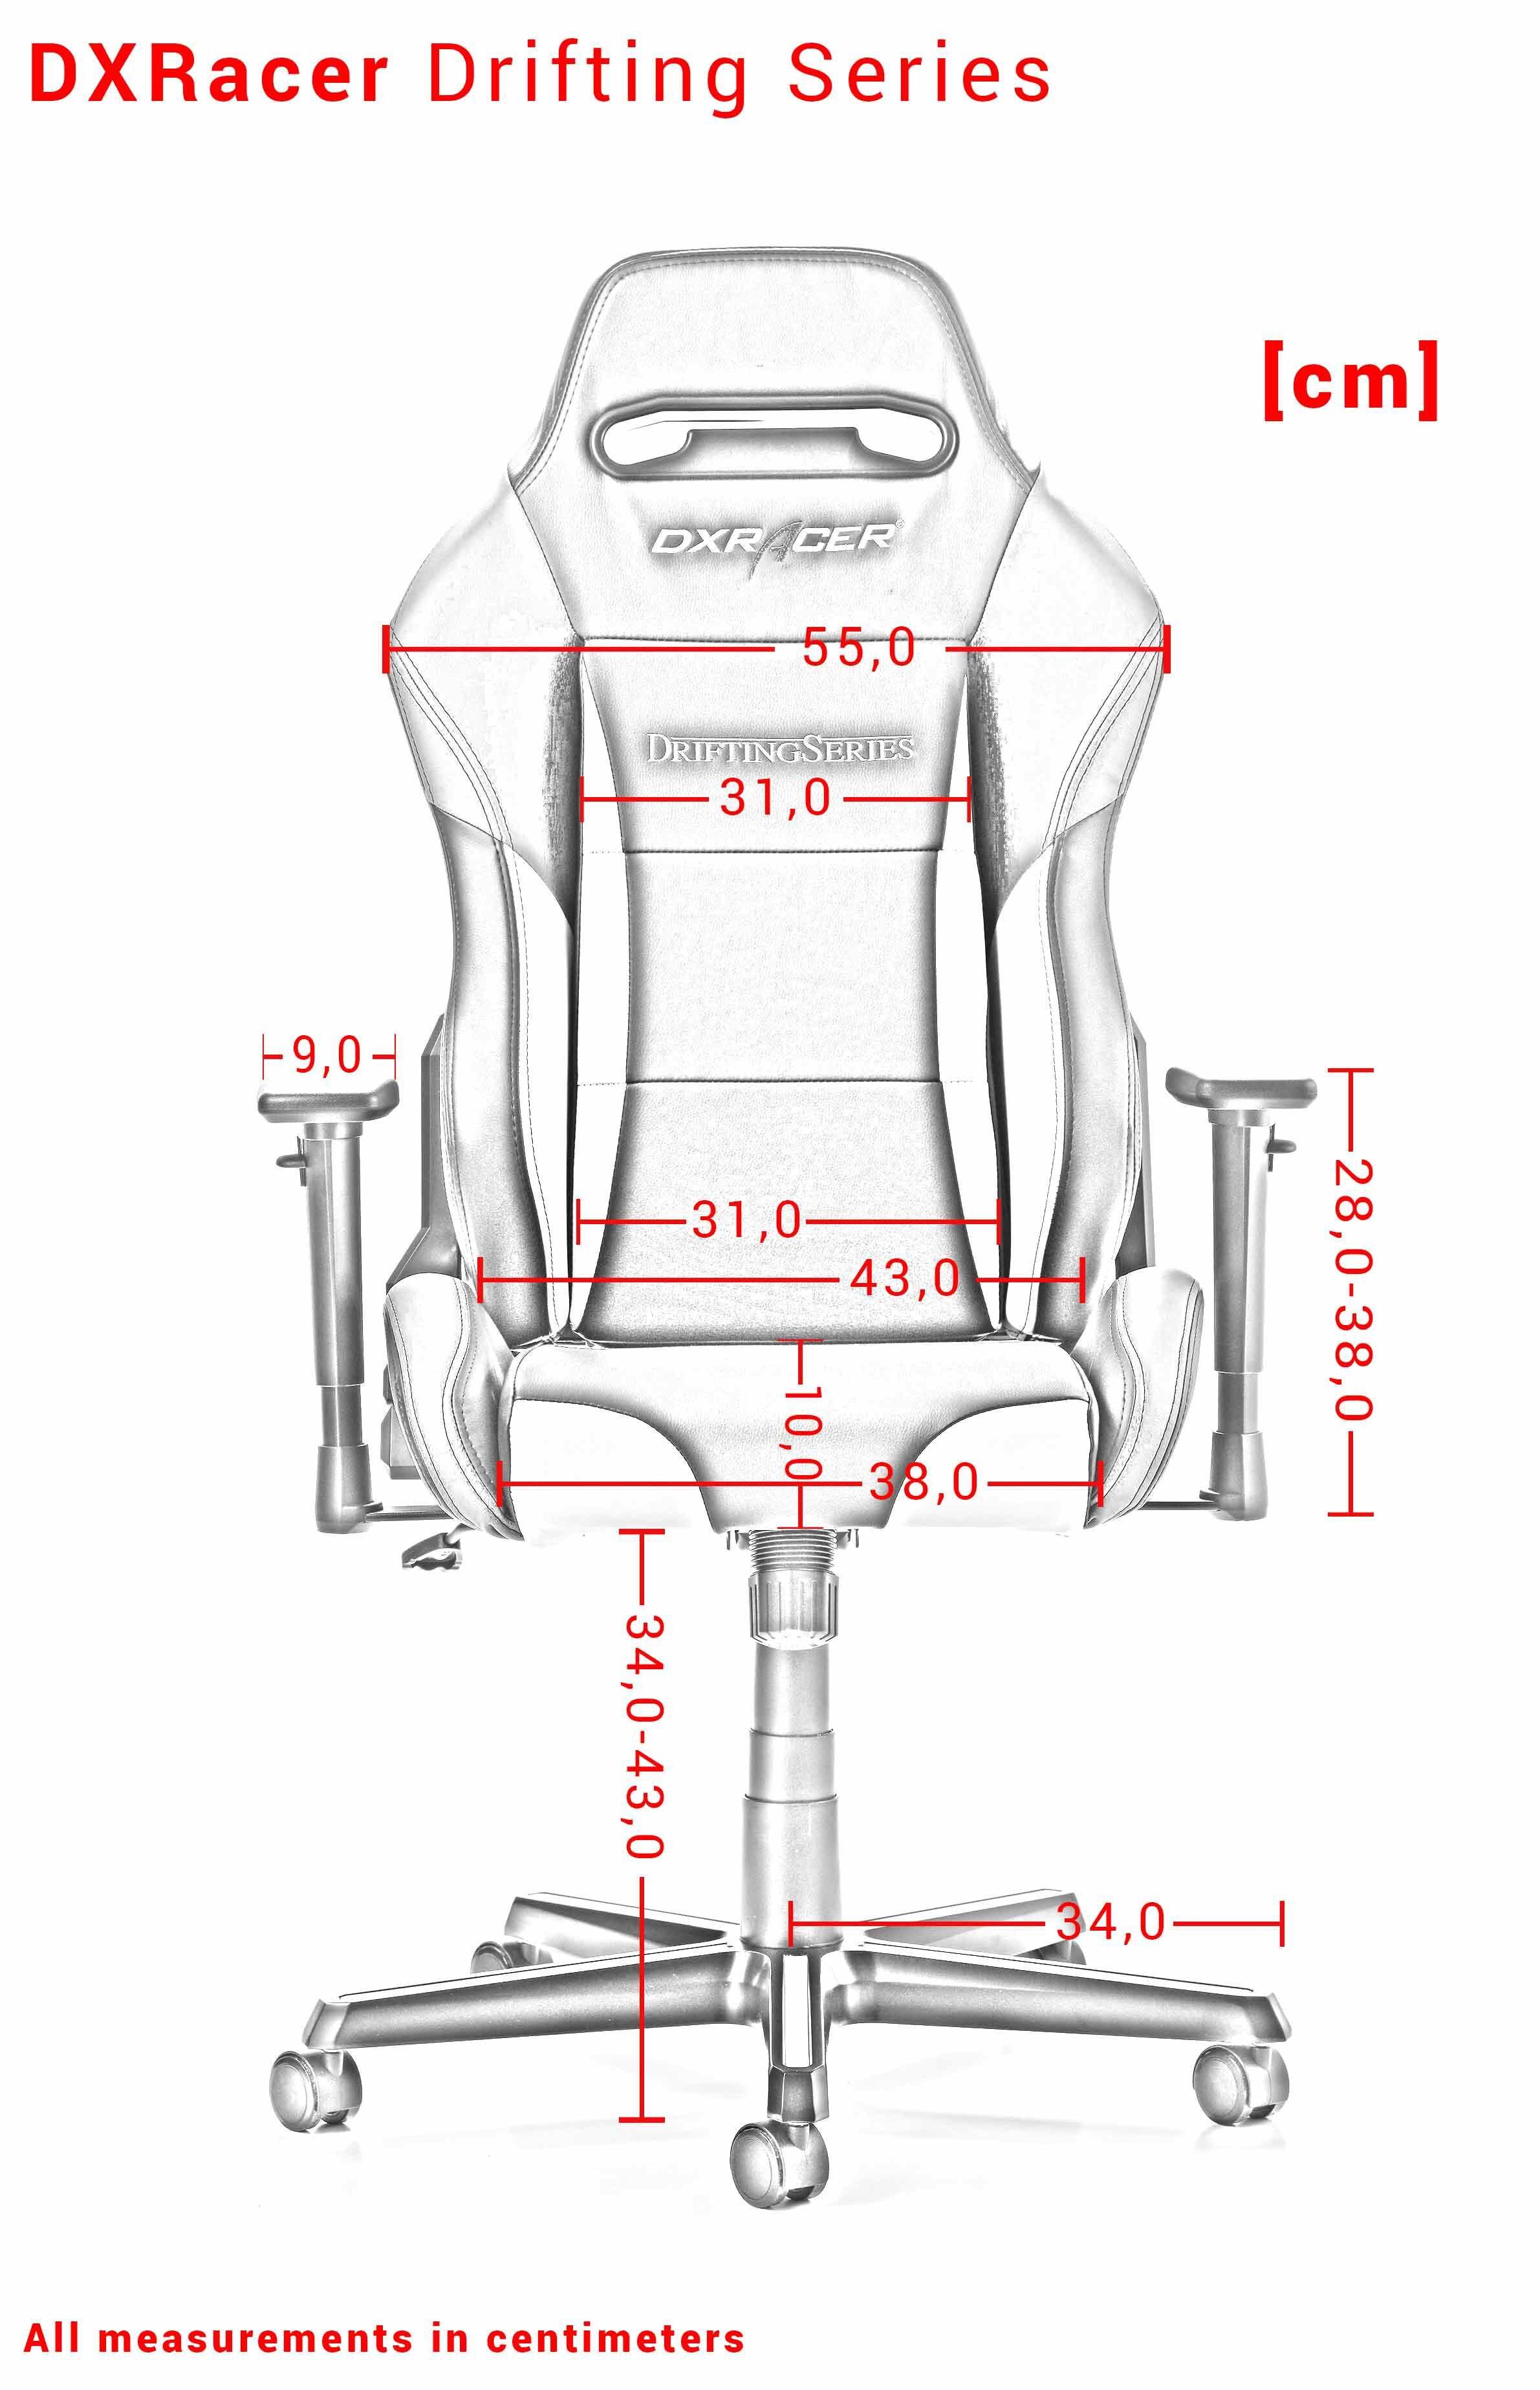 DXRACER DRIFTING SERIES D02-N BLACK GAMING CHAIR (Cloth + PU)